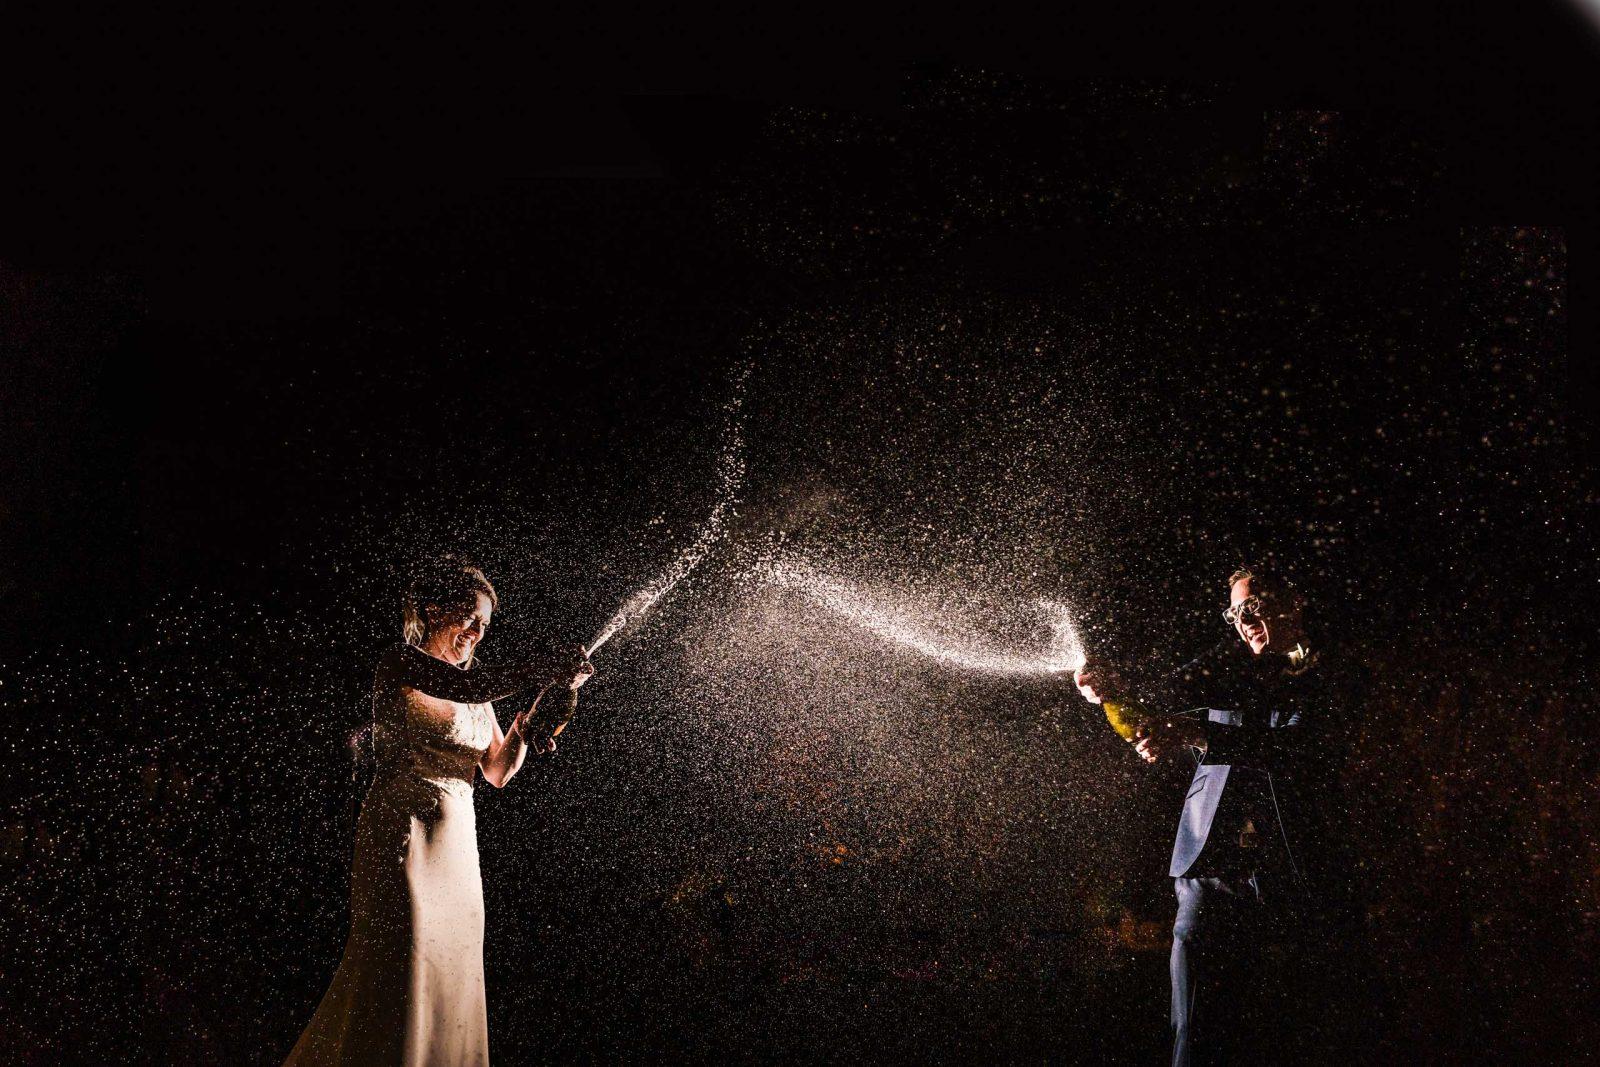 Champagne splash at night with creative lighting